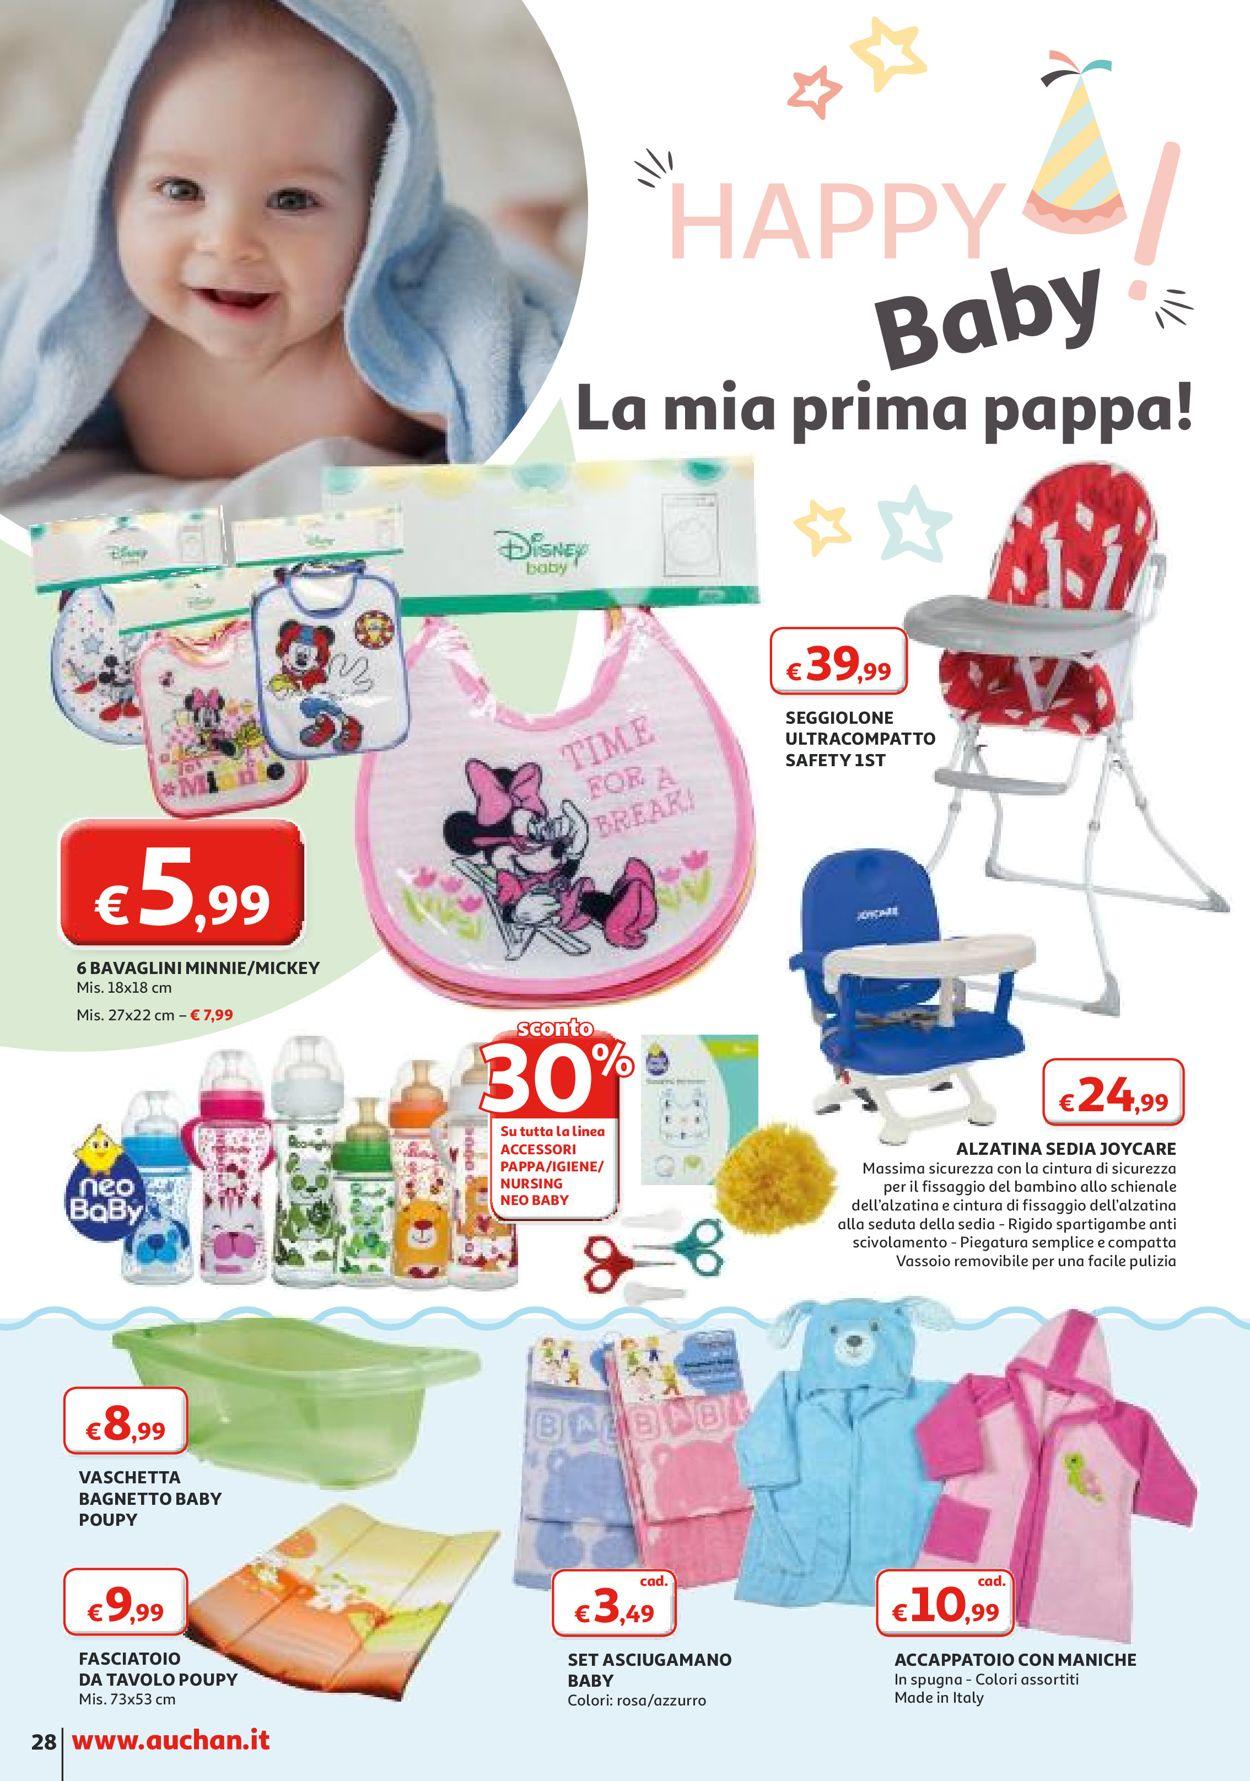 Fasciatoio Auchan